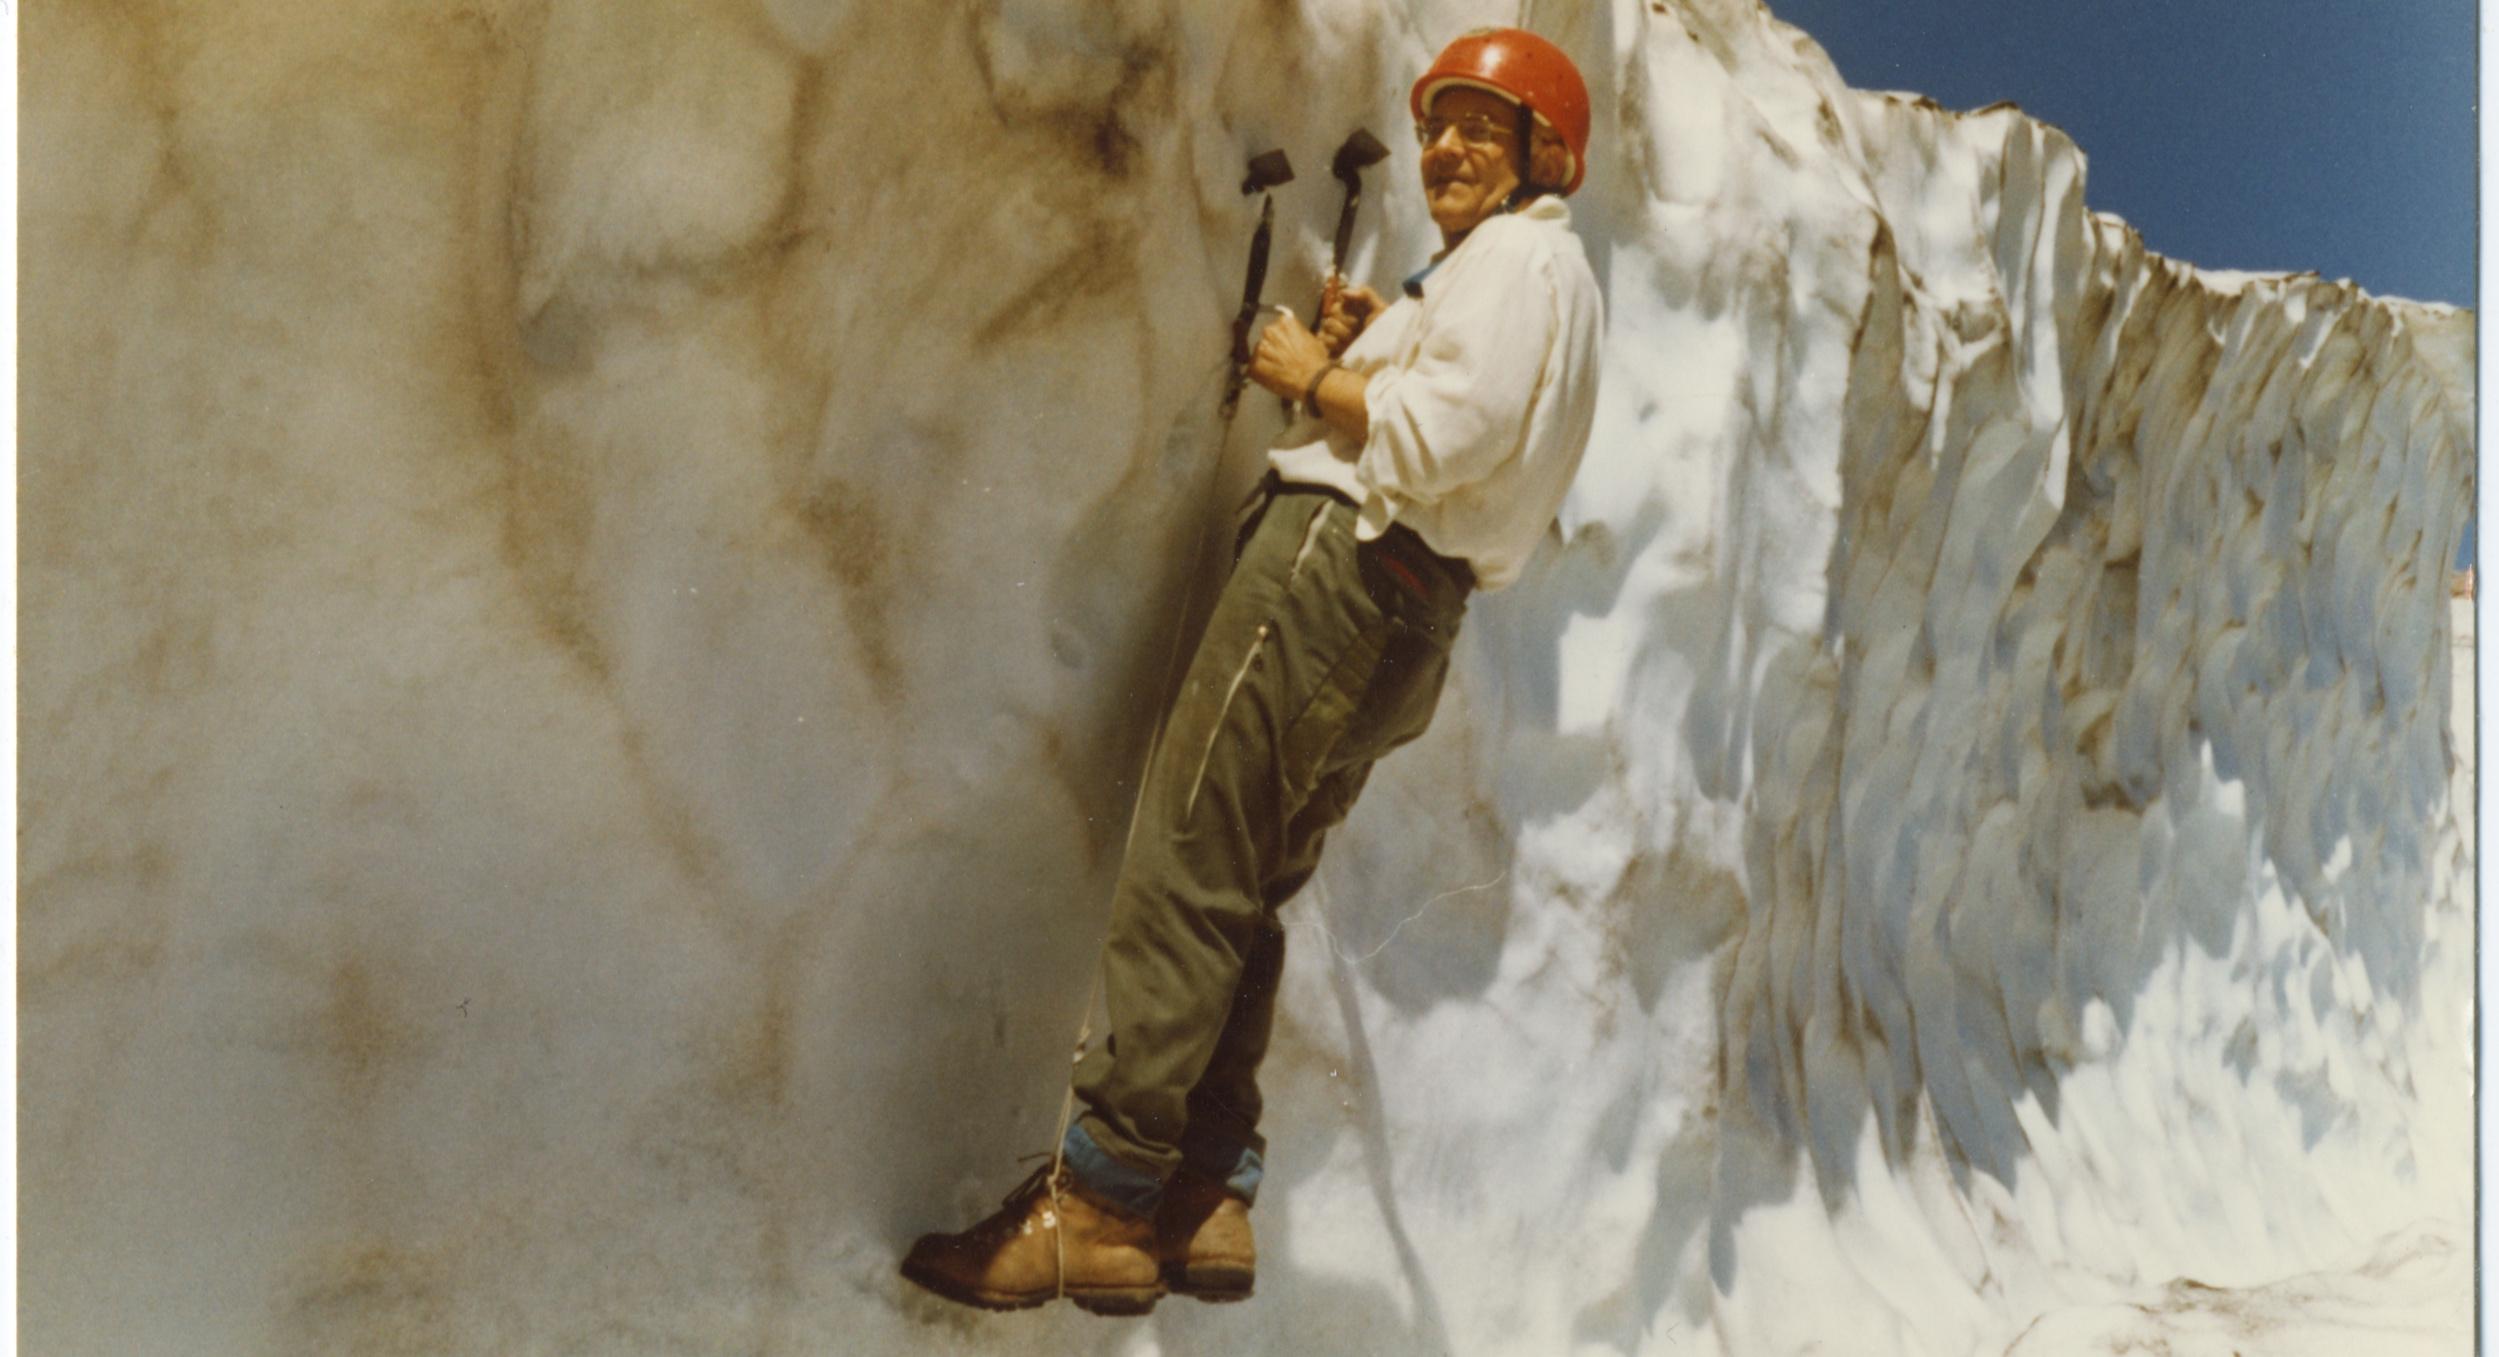 MSR_Larry+Penberthy+Ice+Climbing.jpg